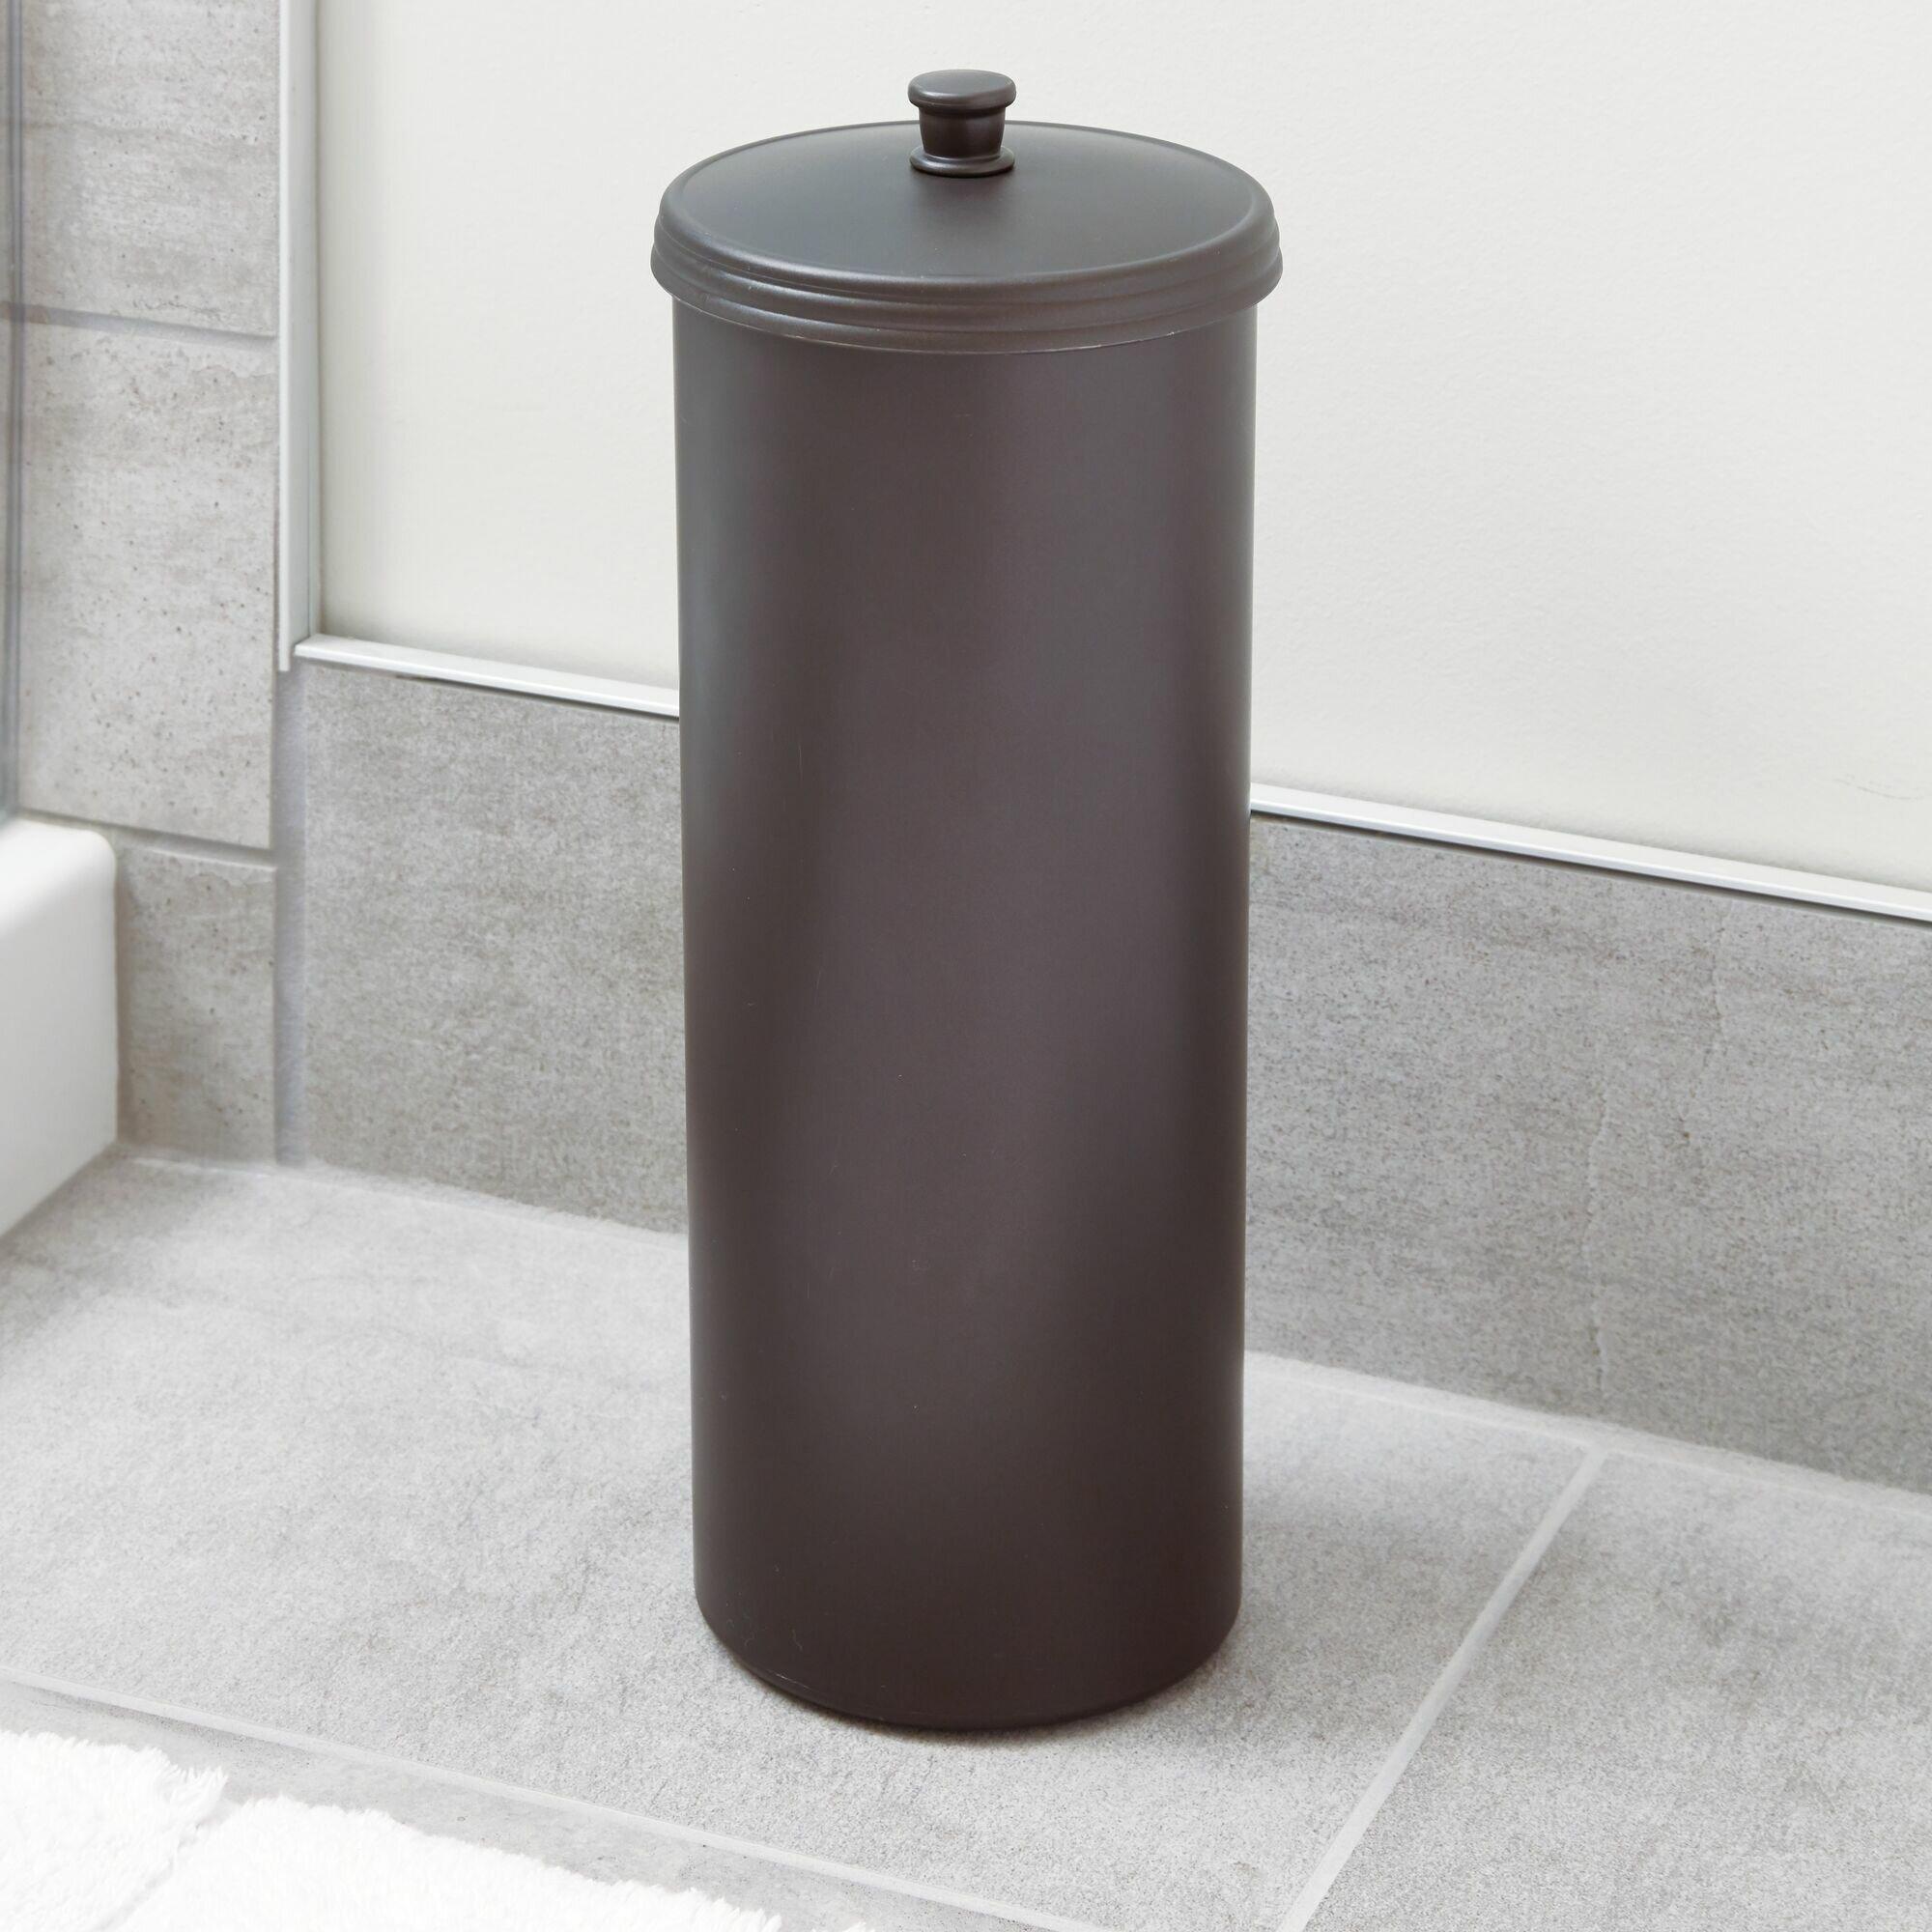 Idesign Kent Free Standing Toilet Paper Holder Reviews Wayfair